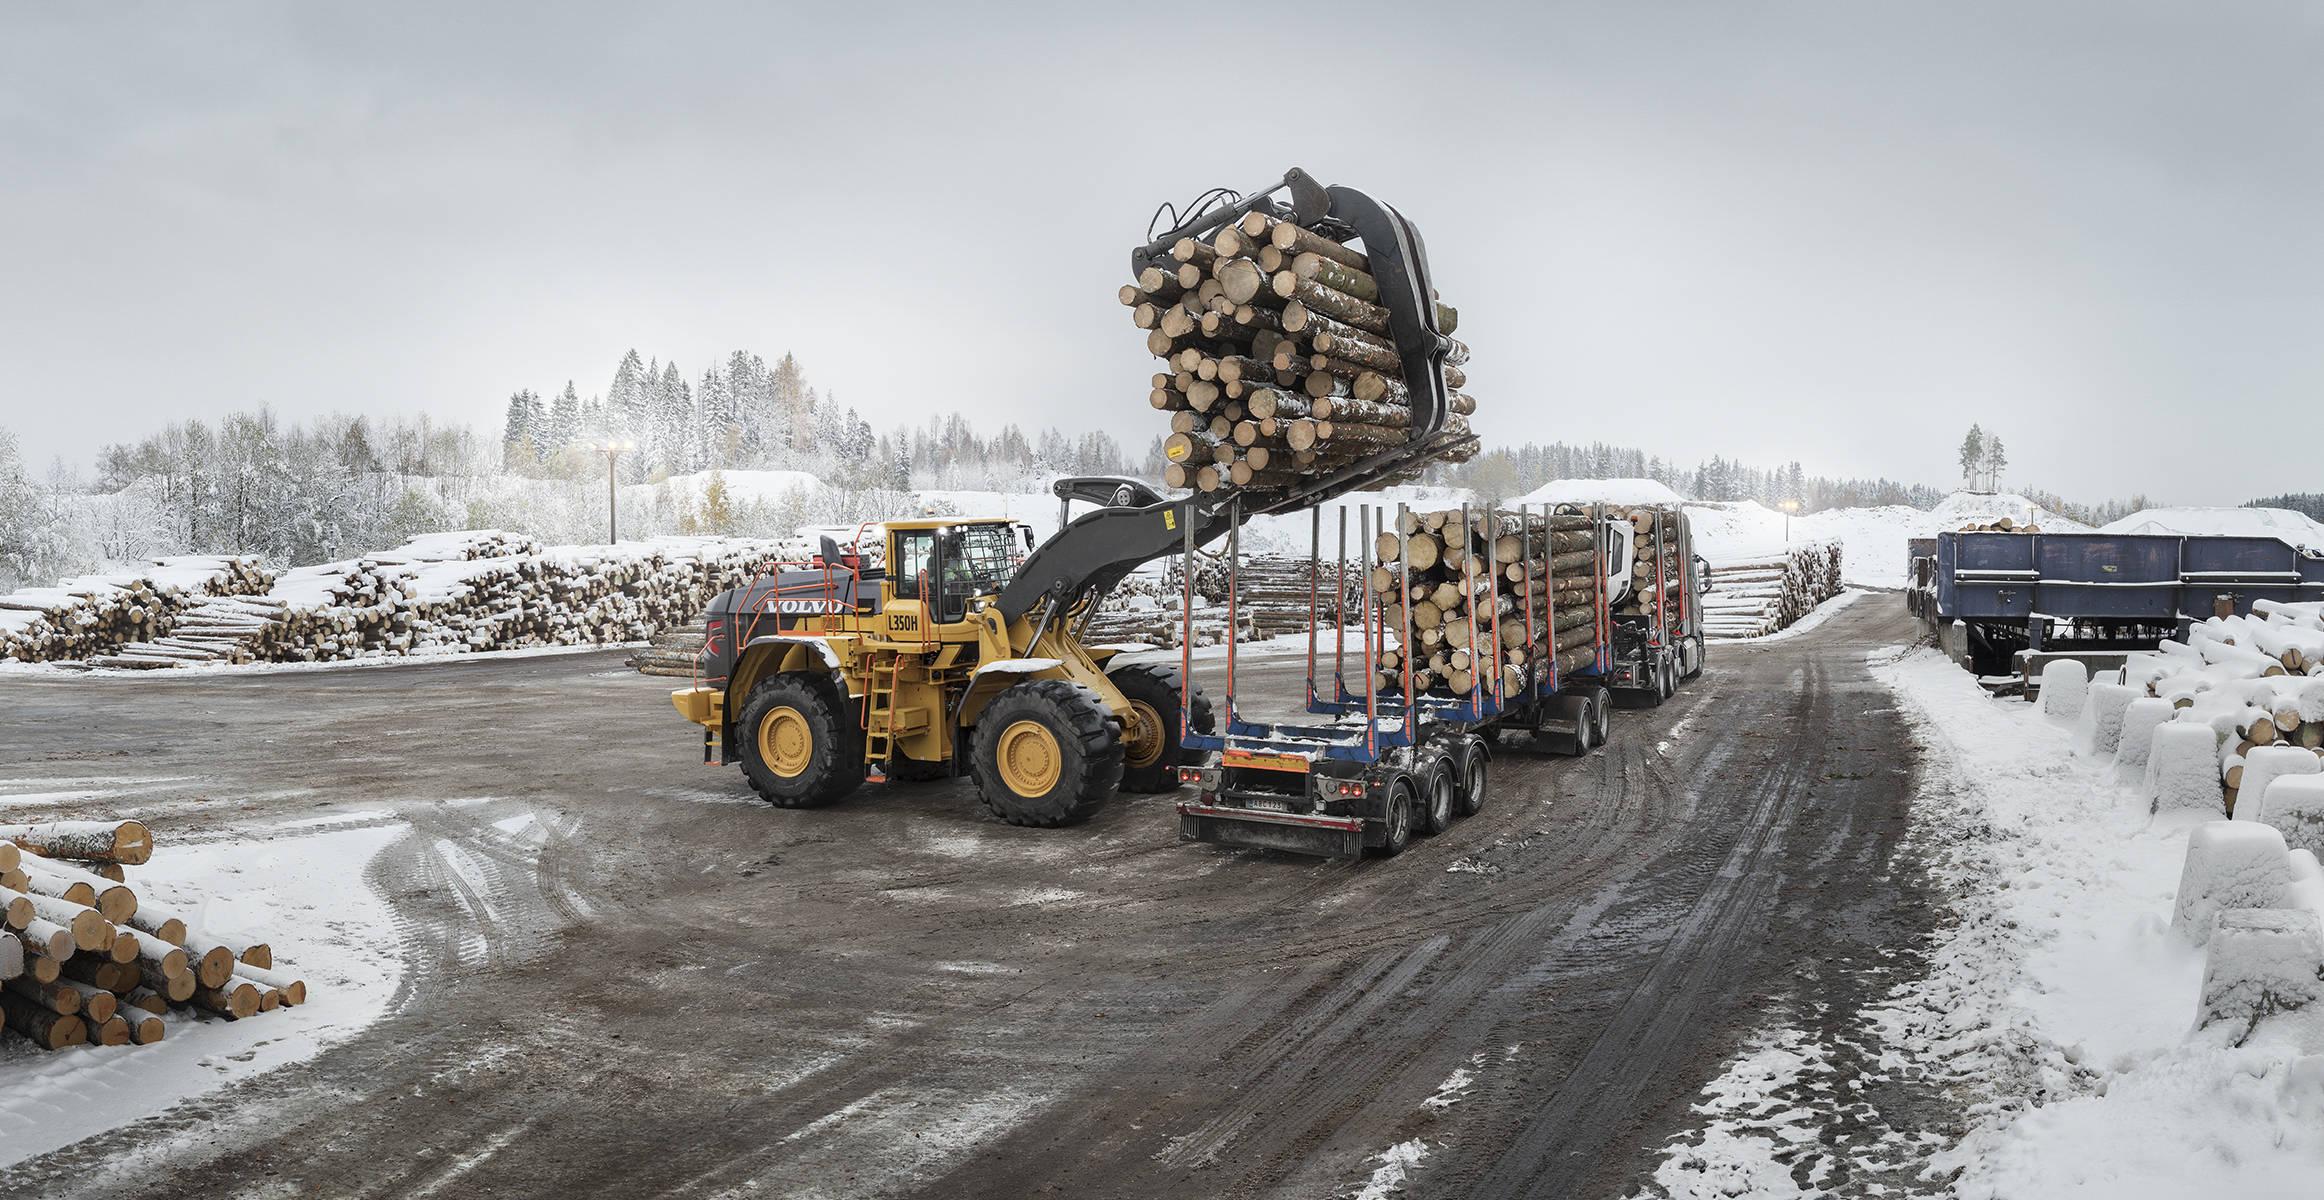 pale grandi le ammiraglie Volvo-benefits-wheel-loader-l350h-t3-t4f-built-for-the-job-2324x1200